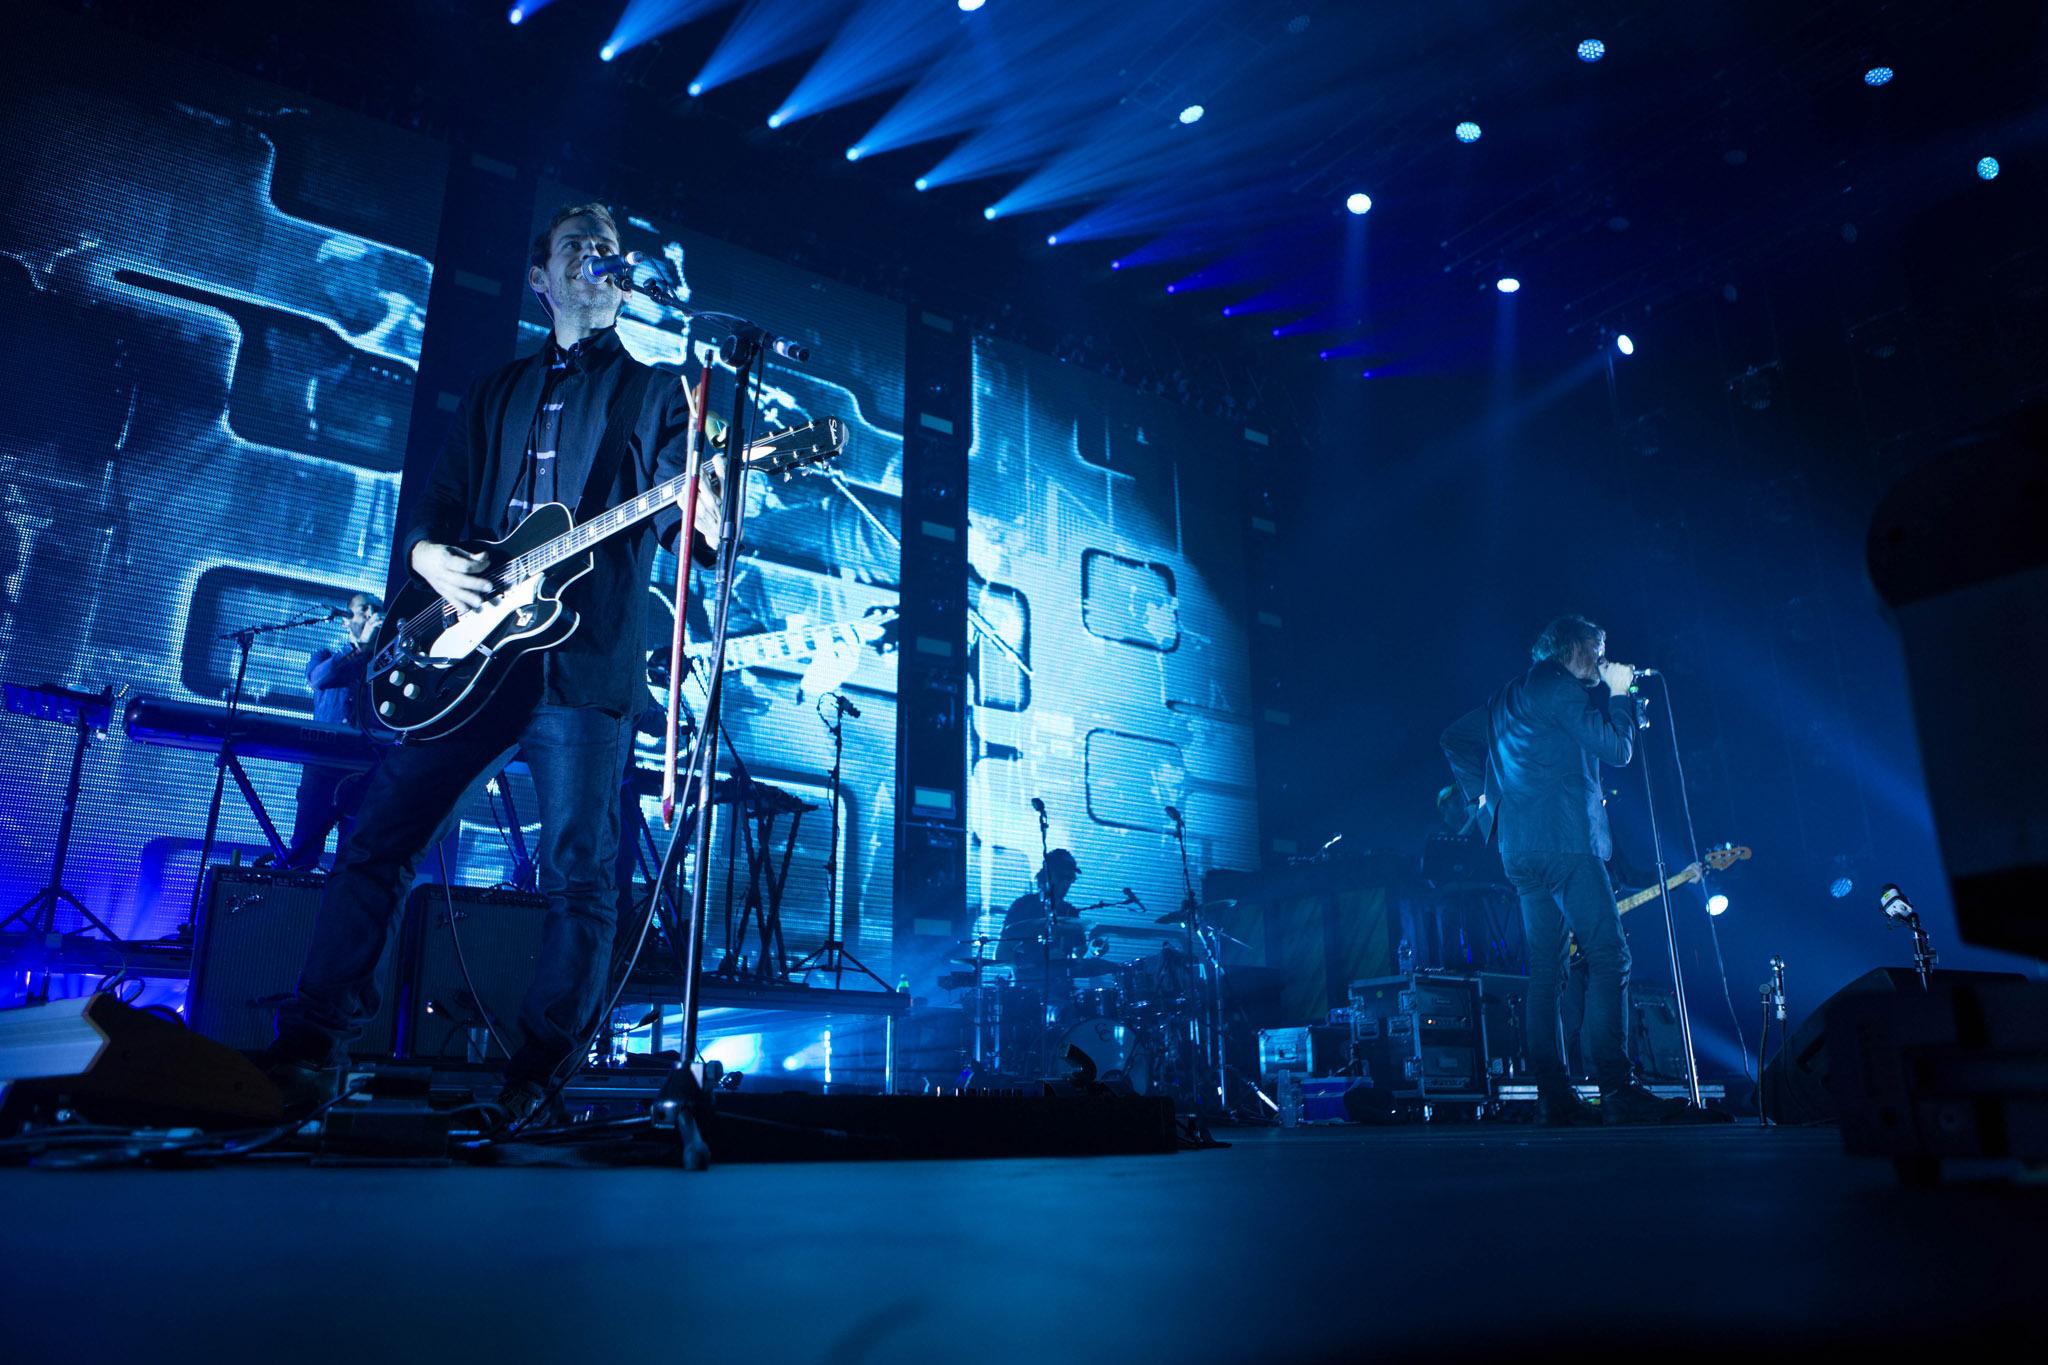 The National, O2 Arena, London